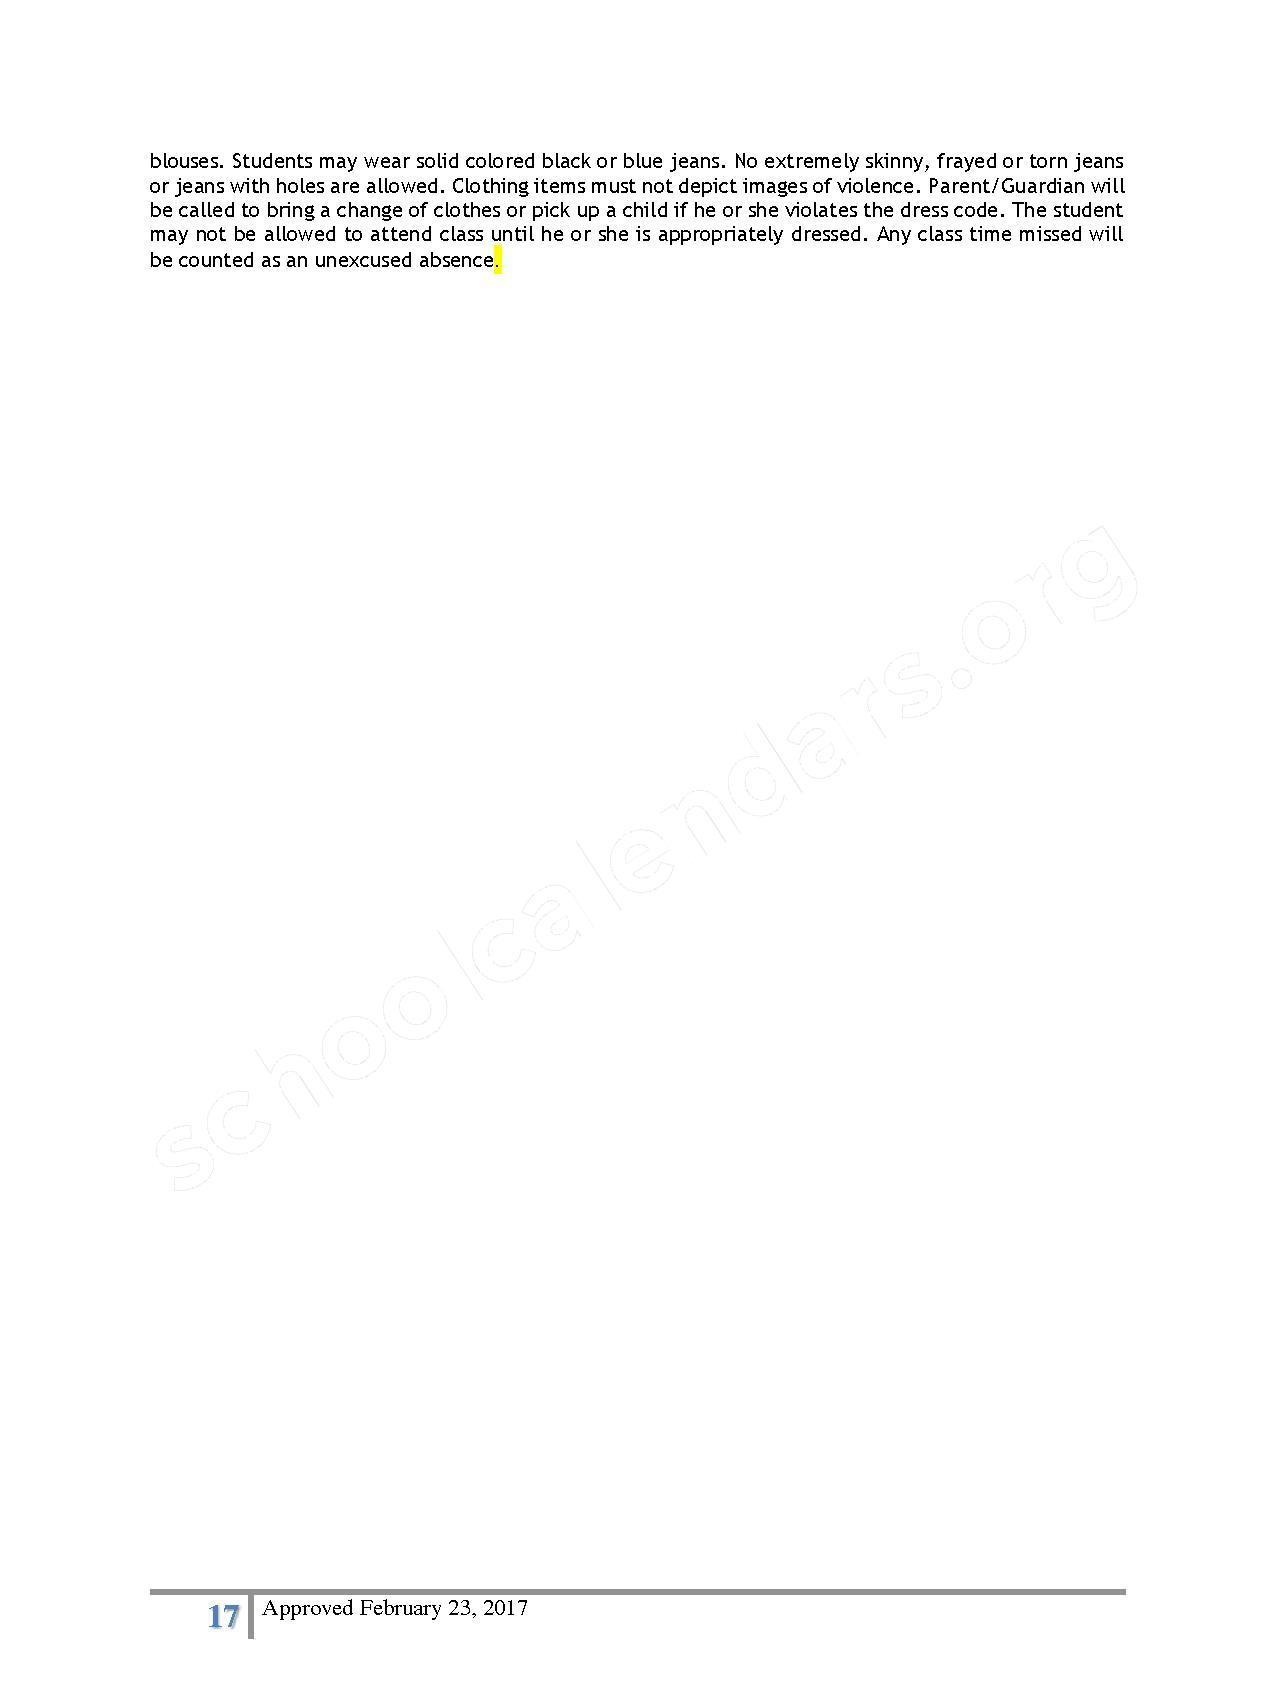 2016 - 2017 District Calendar – Lisa Academy Public Charter Schools – page 17